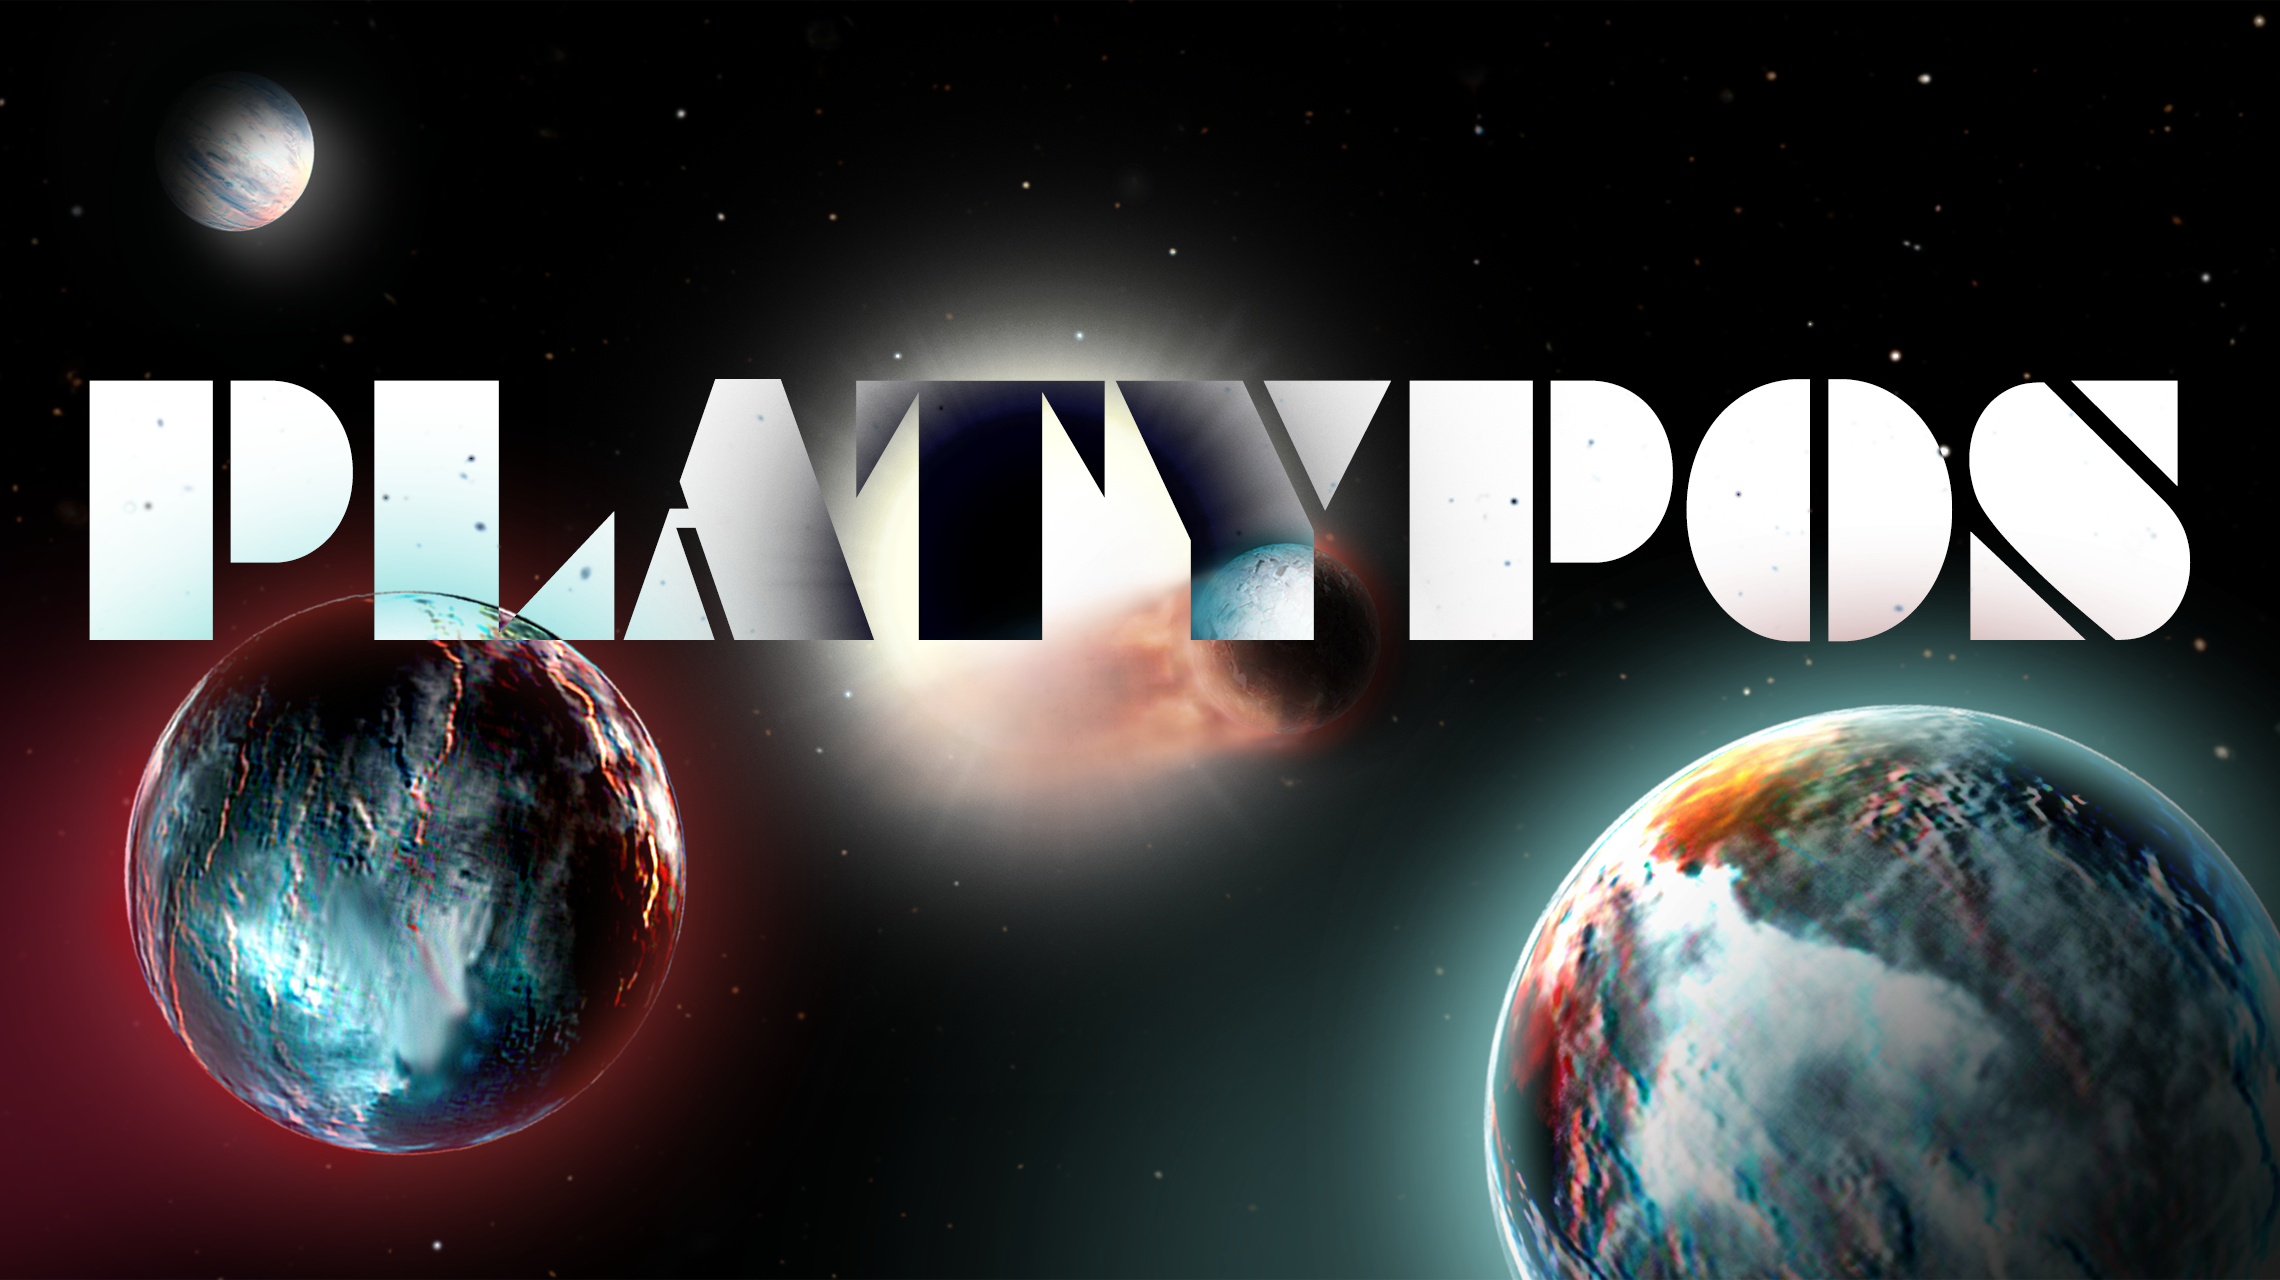 supplementary_files/an_Laura_Ketzer_PLATYPOS/platypos2.png